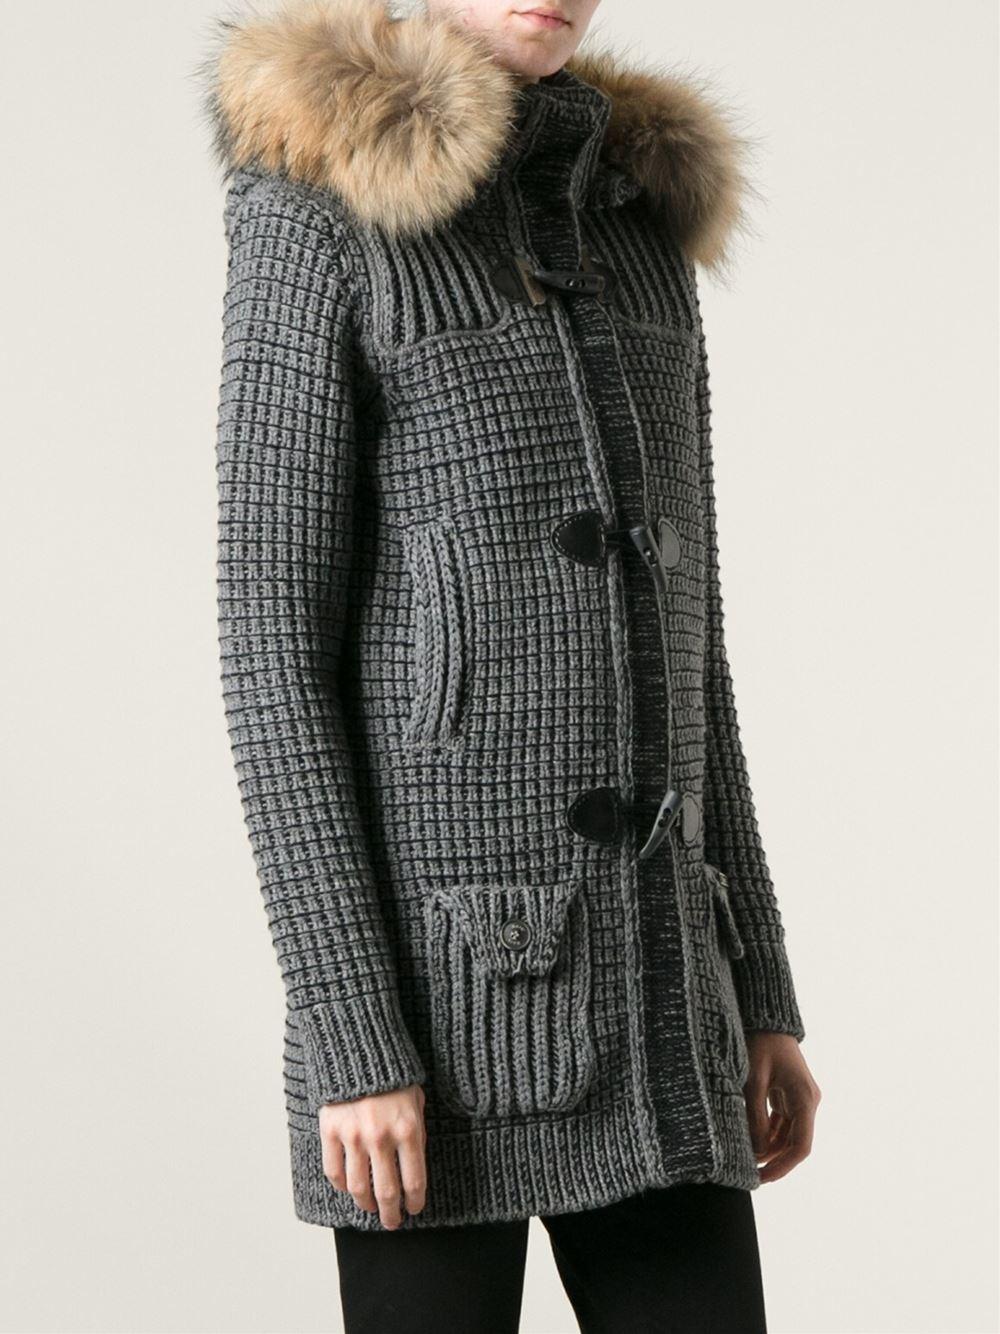 Bark Knit Duffle Coat in Gray   Lyst